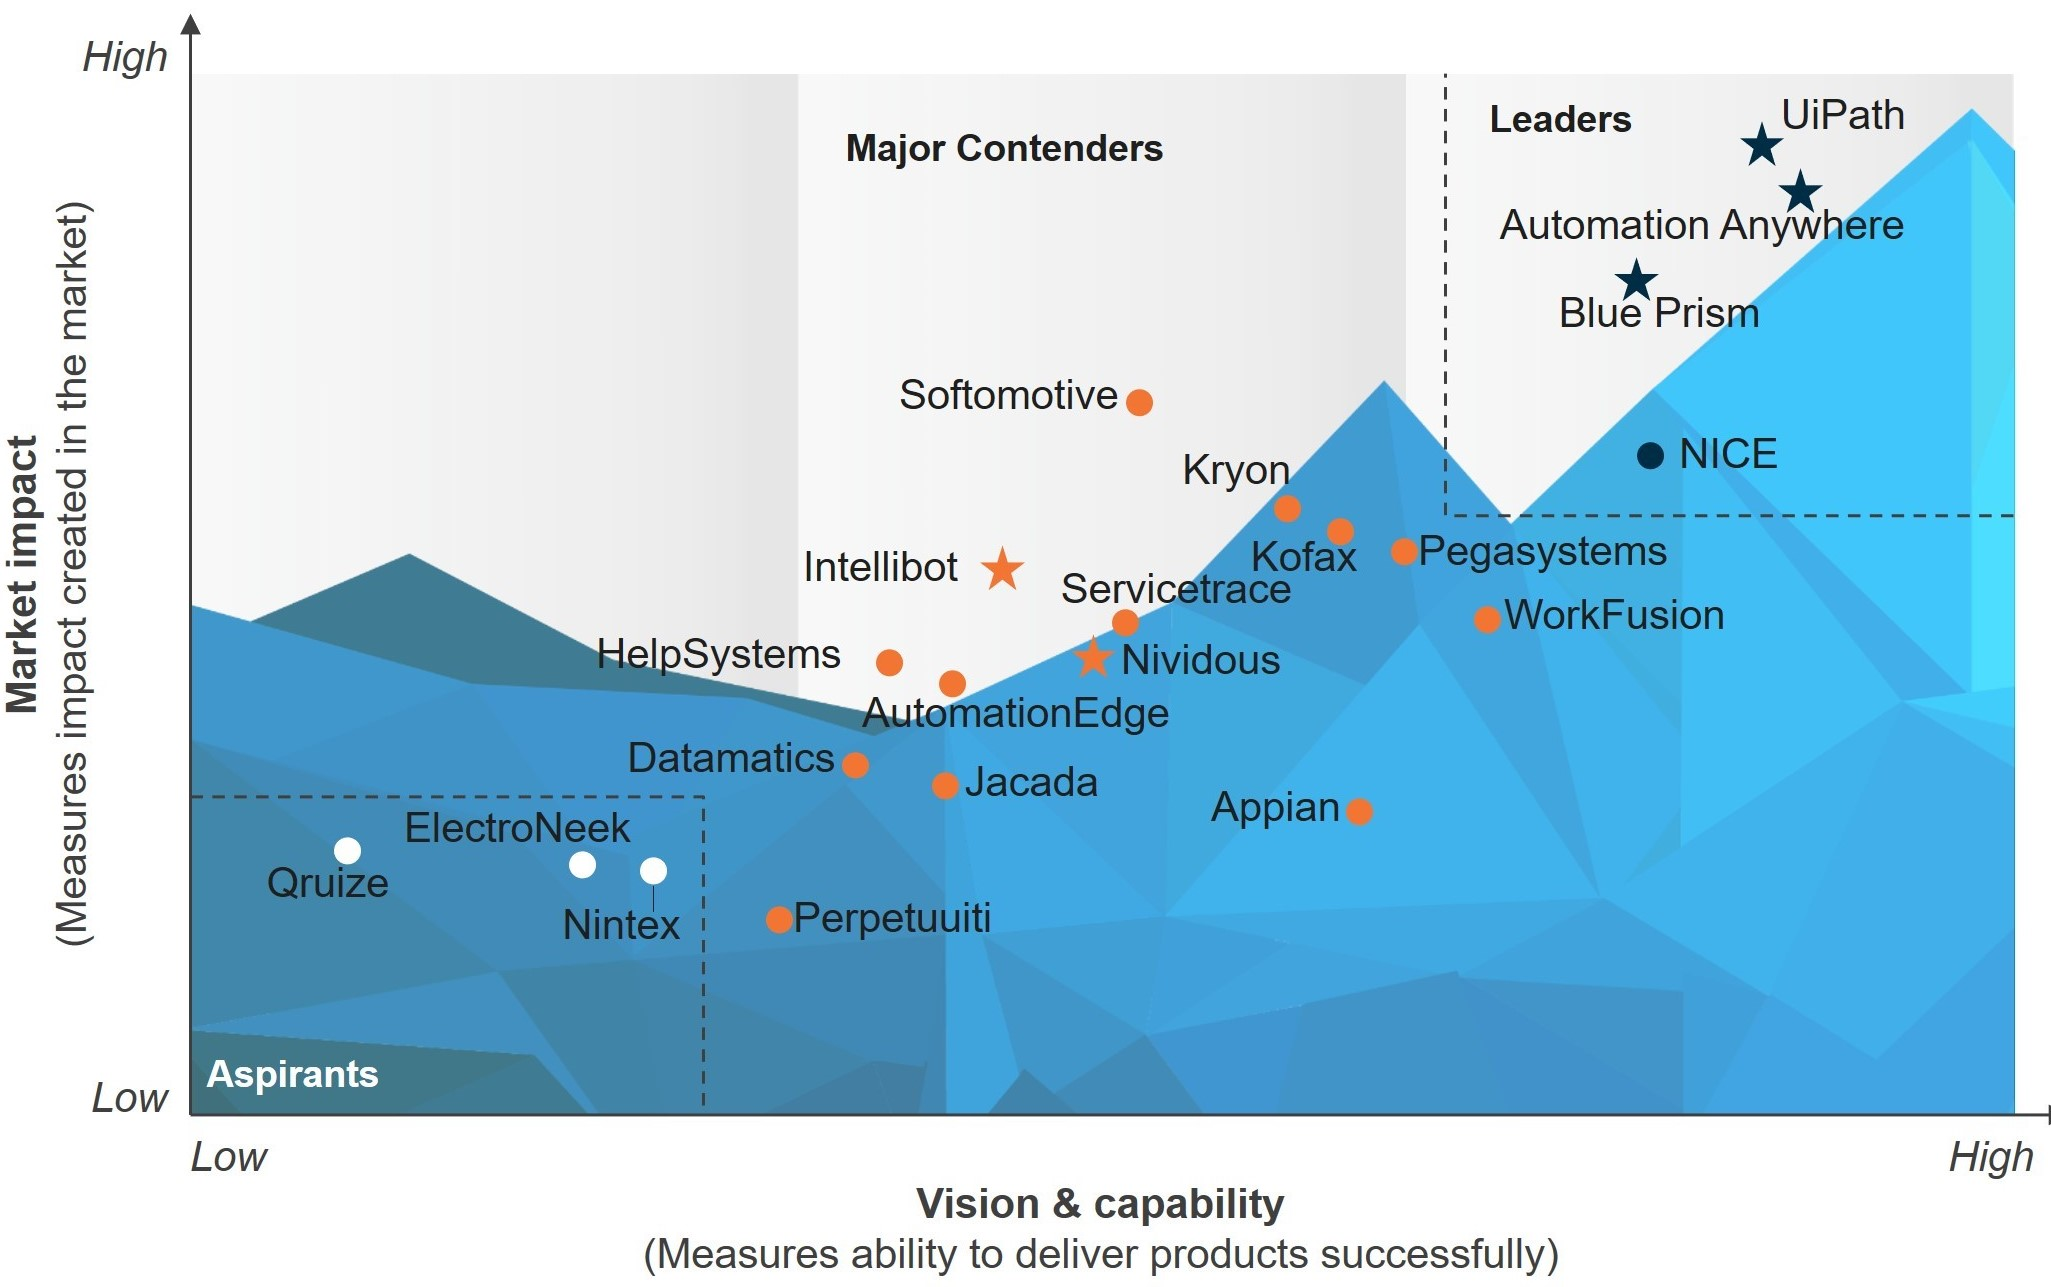 Everest Group PEAK Matrix For Robotic Process Automation (RPA) Technology Vendors 2020